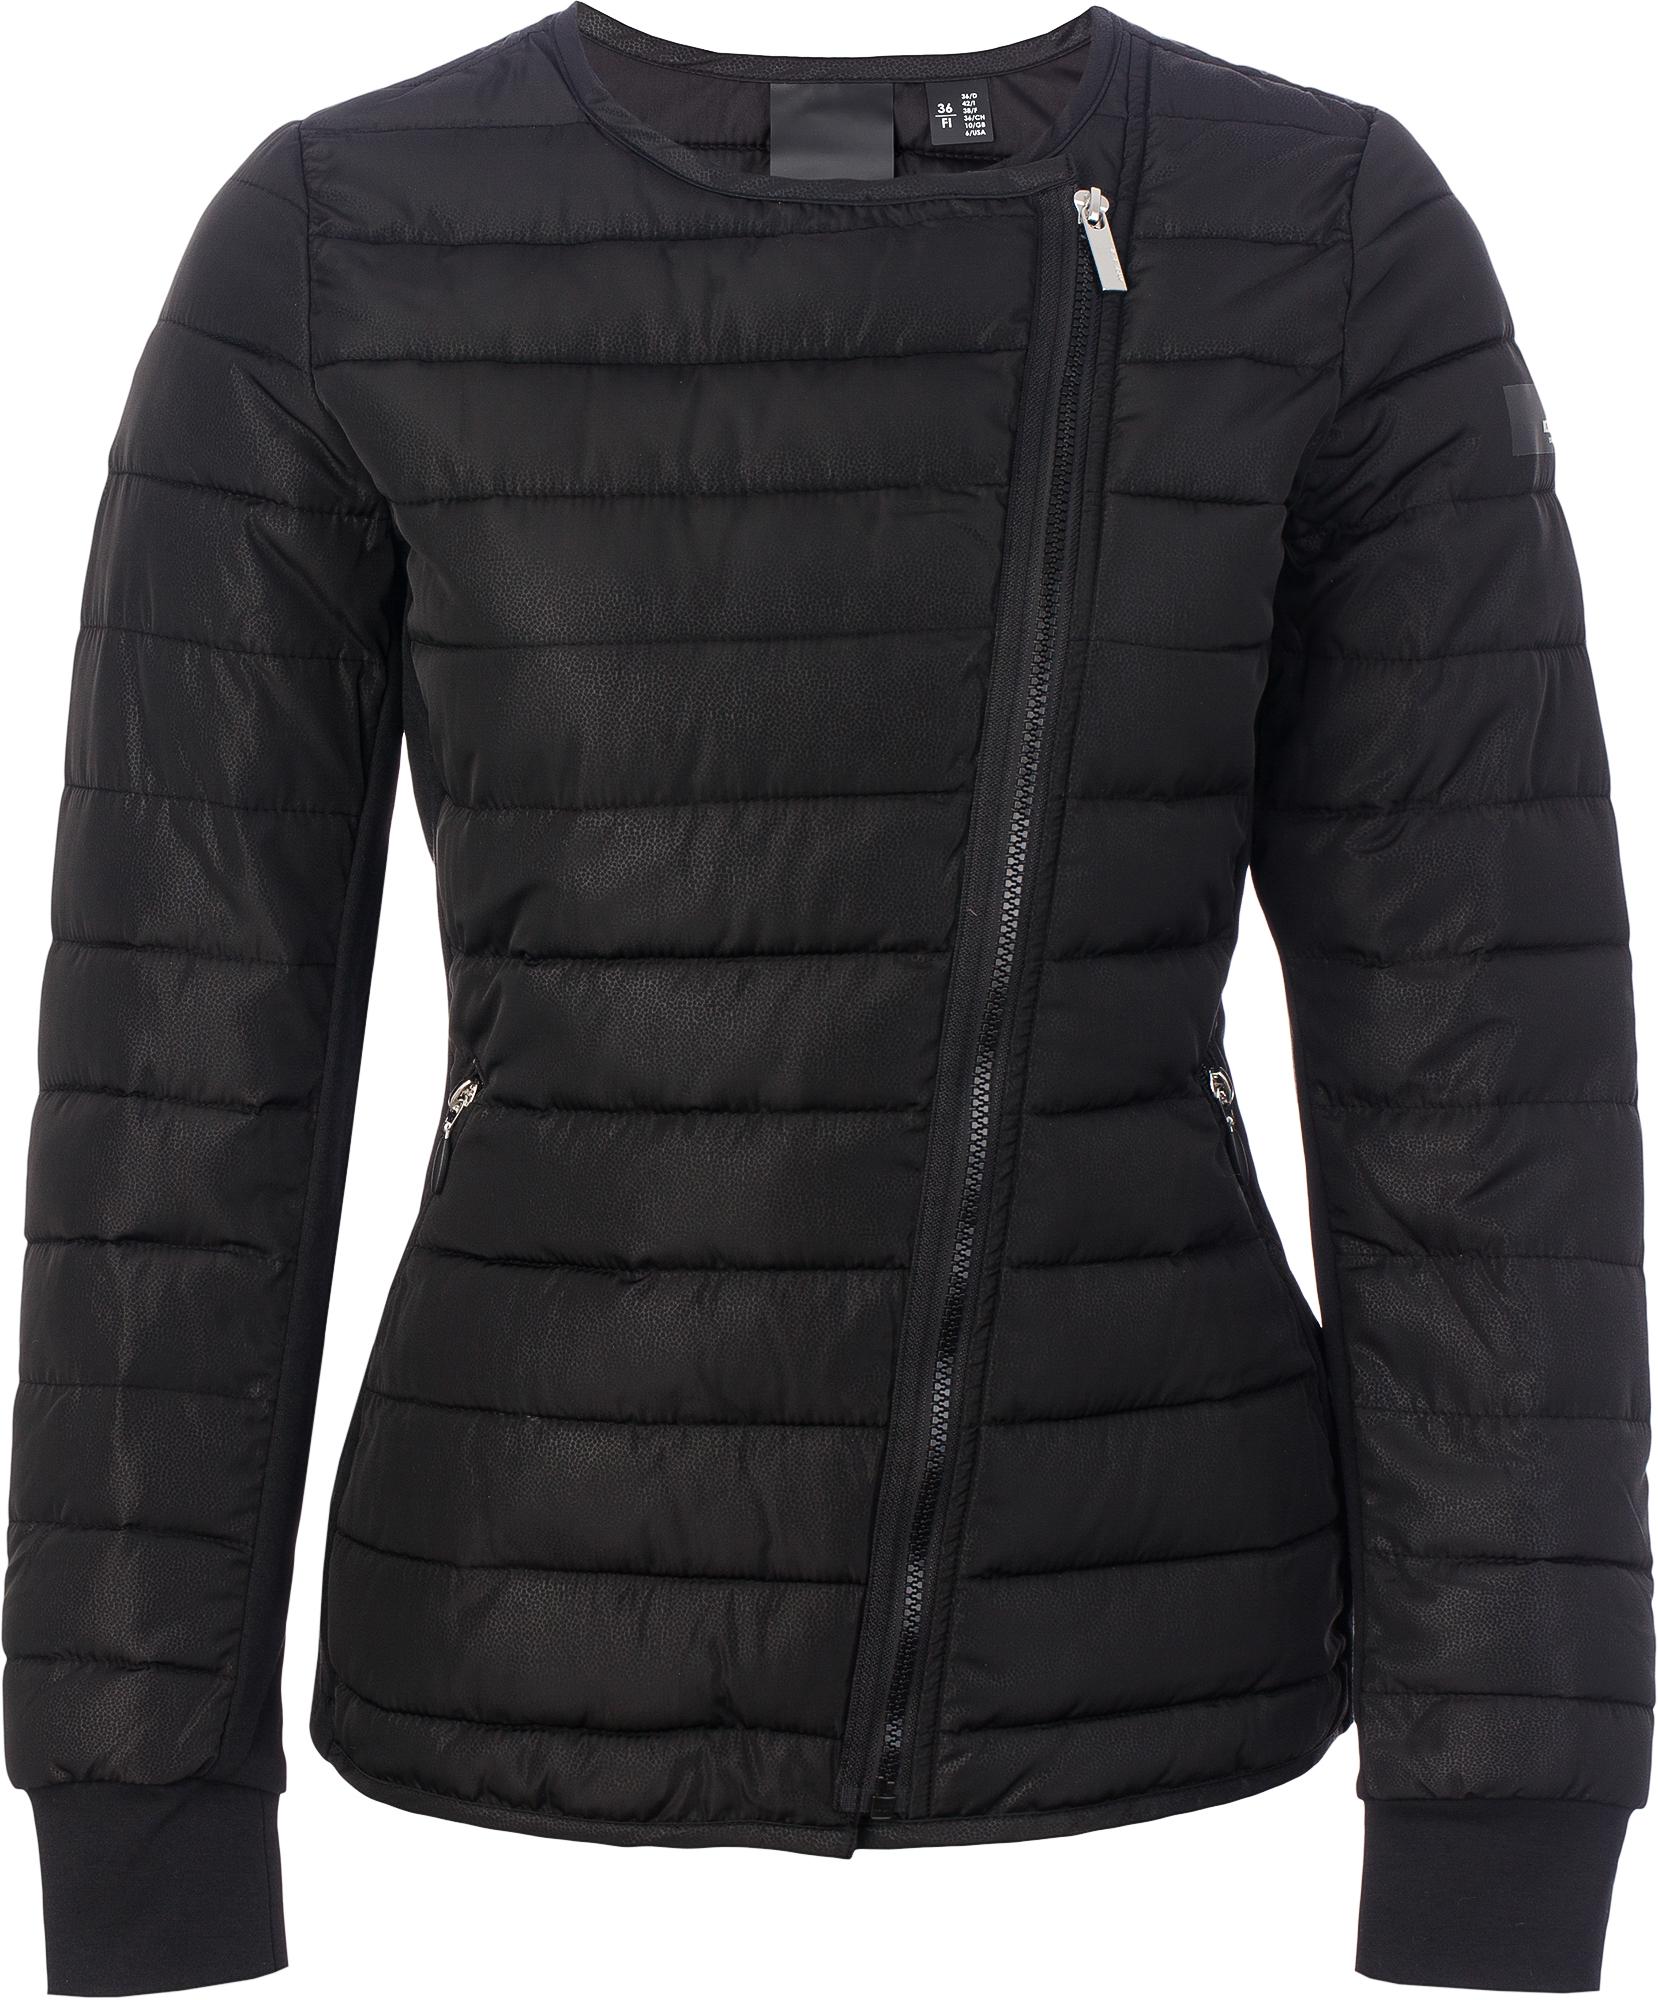 IcePeak Куртка утепленная женская IcePeak Carol, размер 48